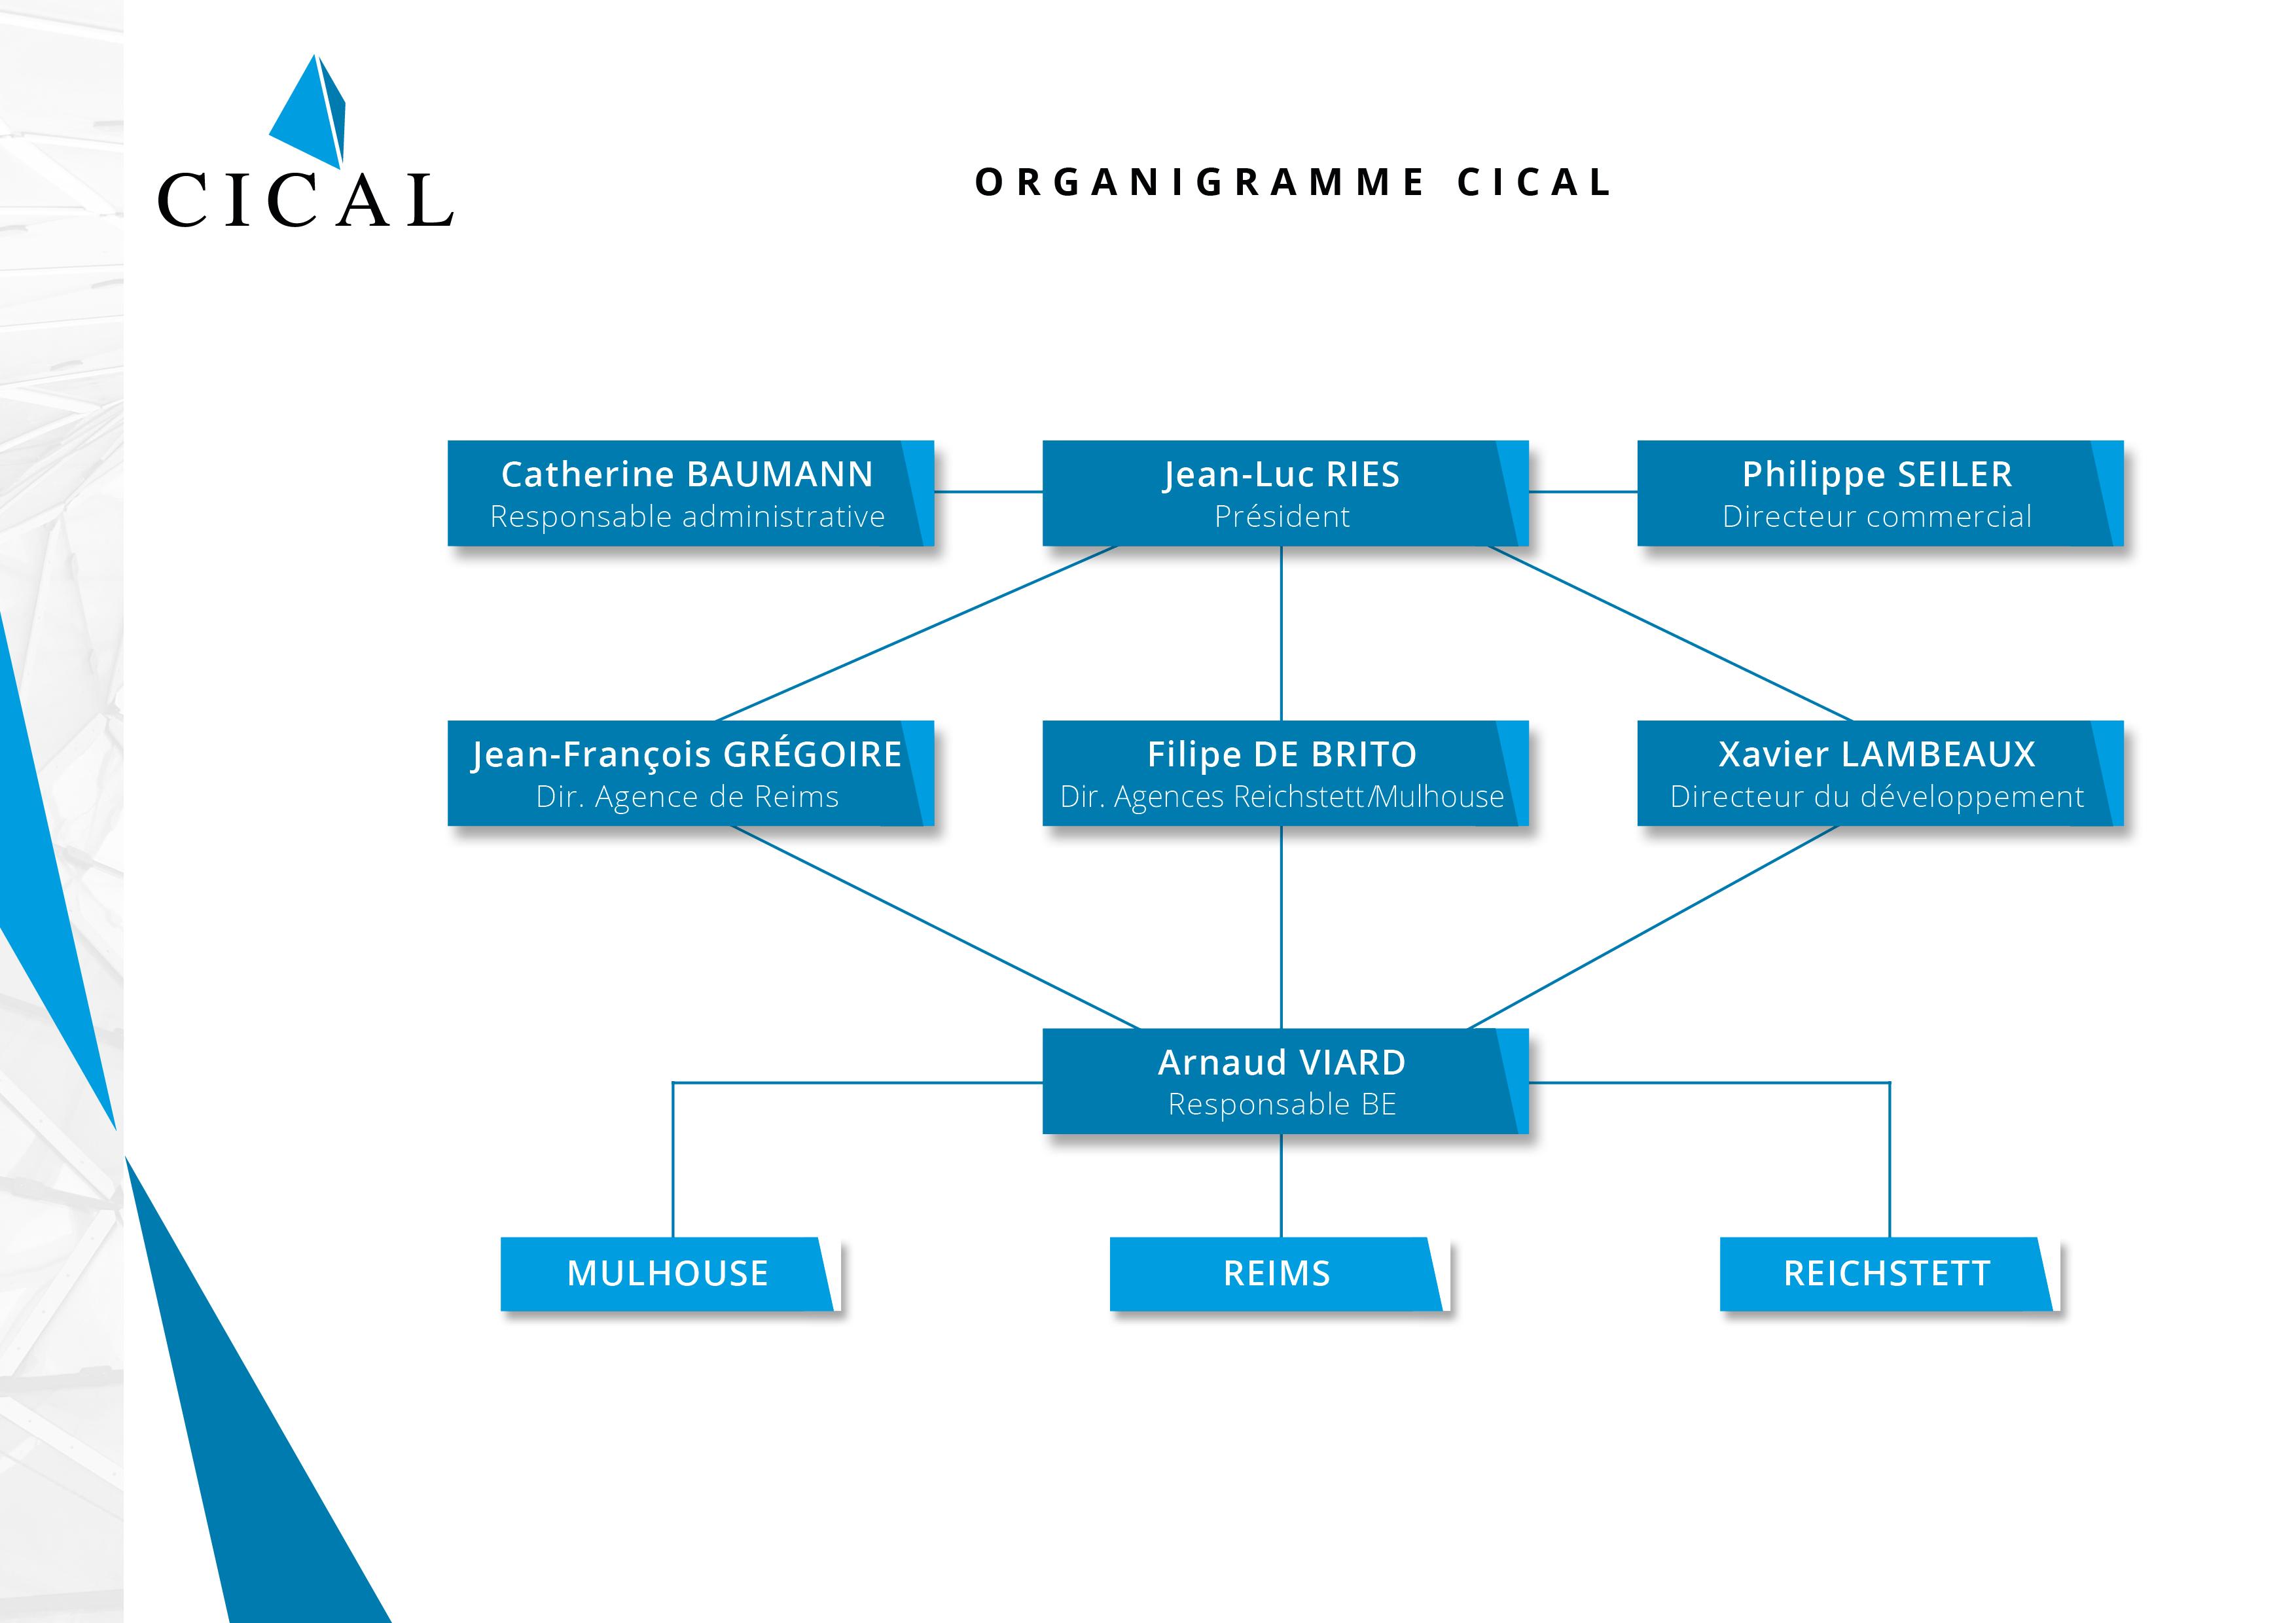 organigramme de CICAL